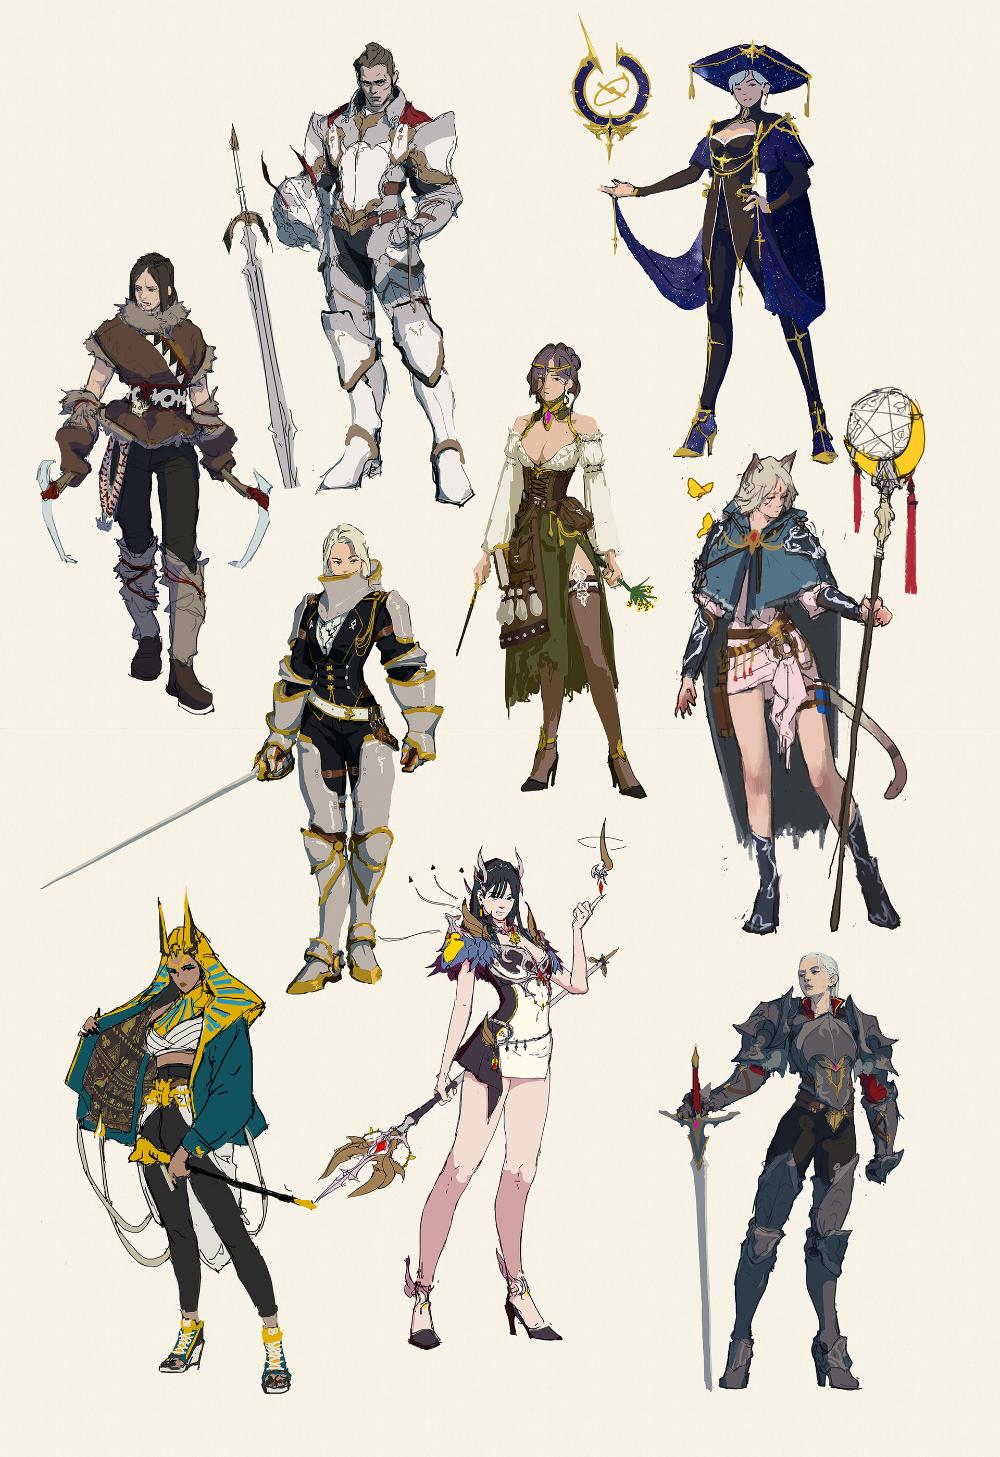 ArtStation Rough Sketches, MEPOPA (Sehun Jeong)